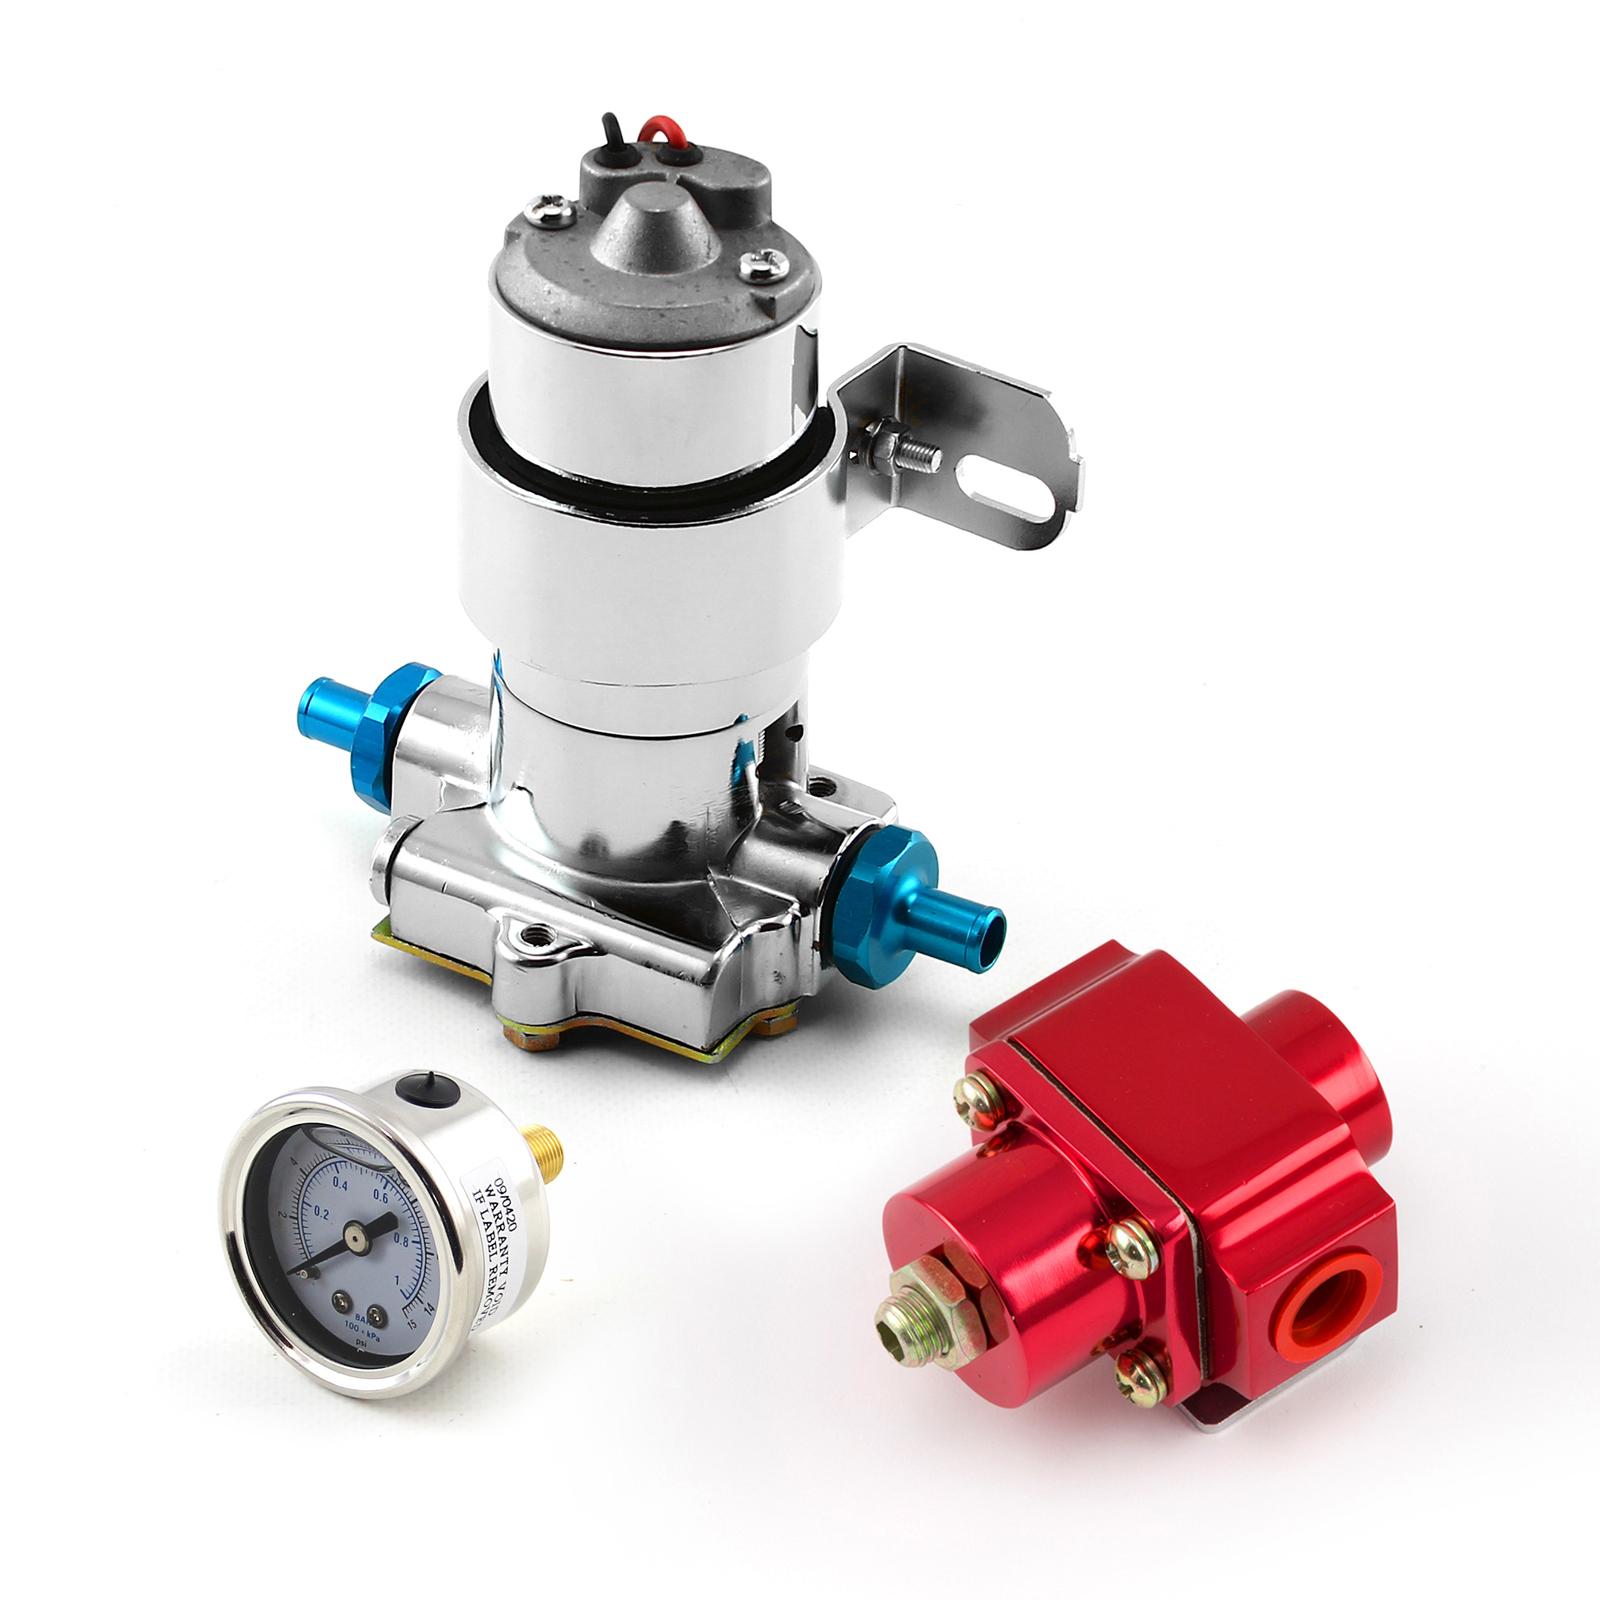 140 Gph Universal Chrome Electric Fuel Pump Red Regulator & Gauge Combo Kit